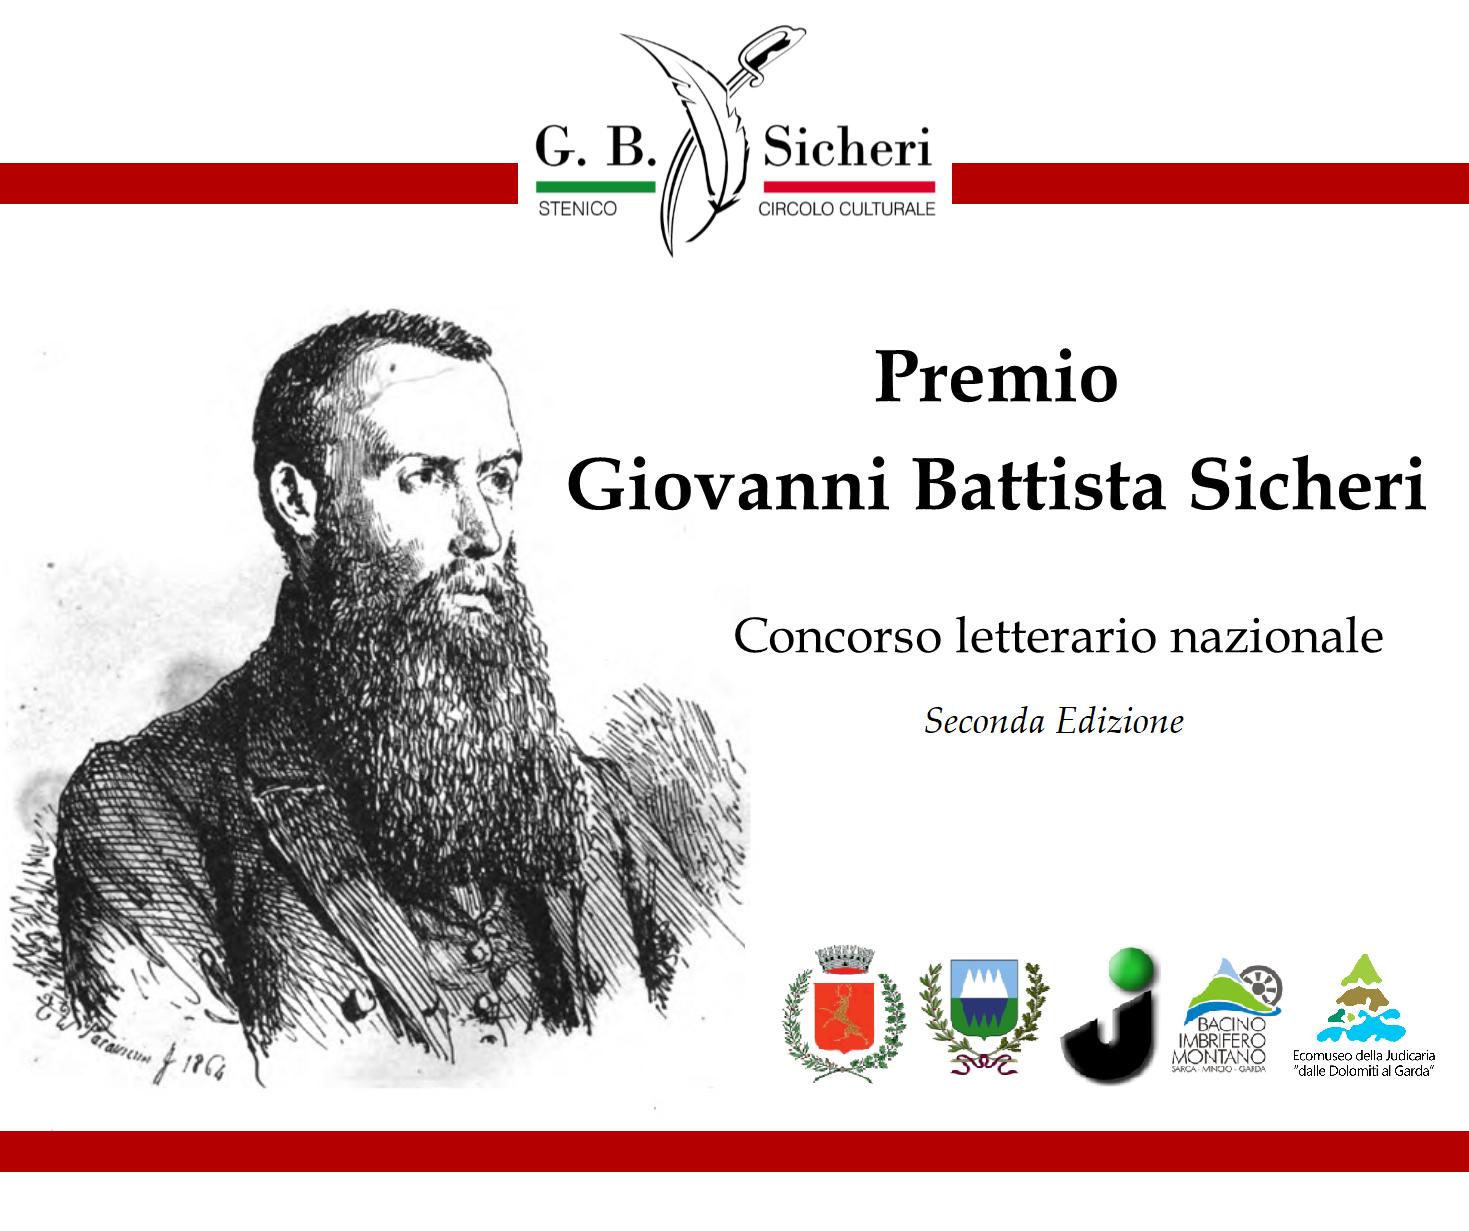 Premio Giovanni Battista Sicheri